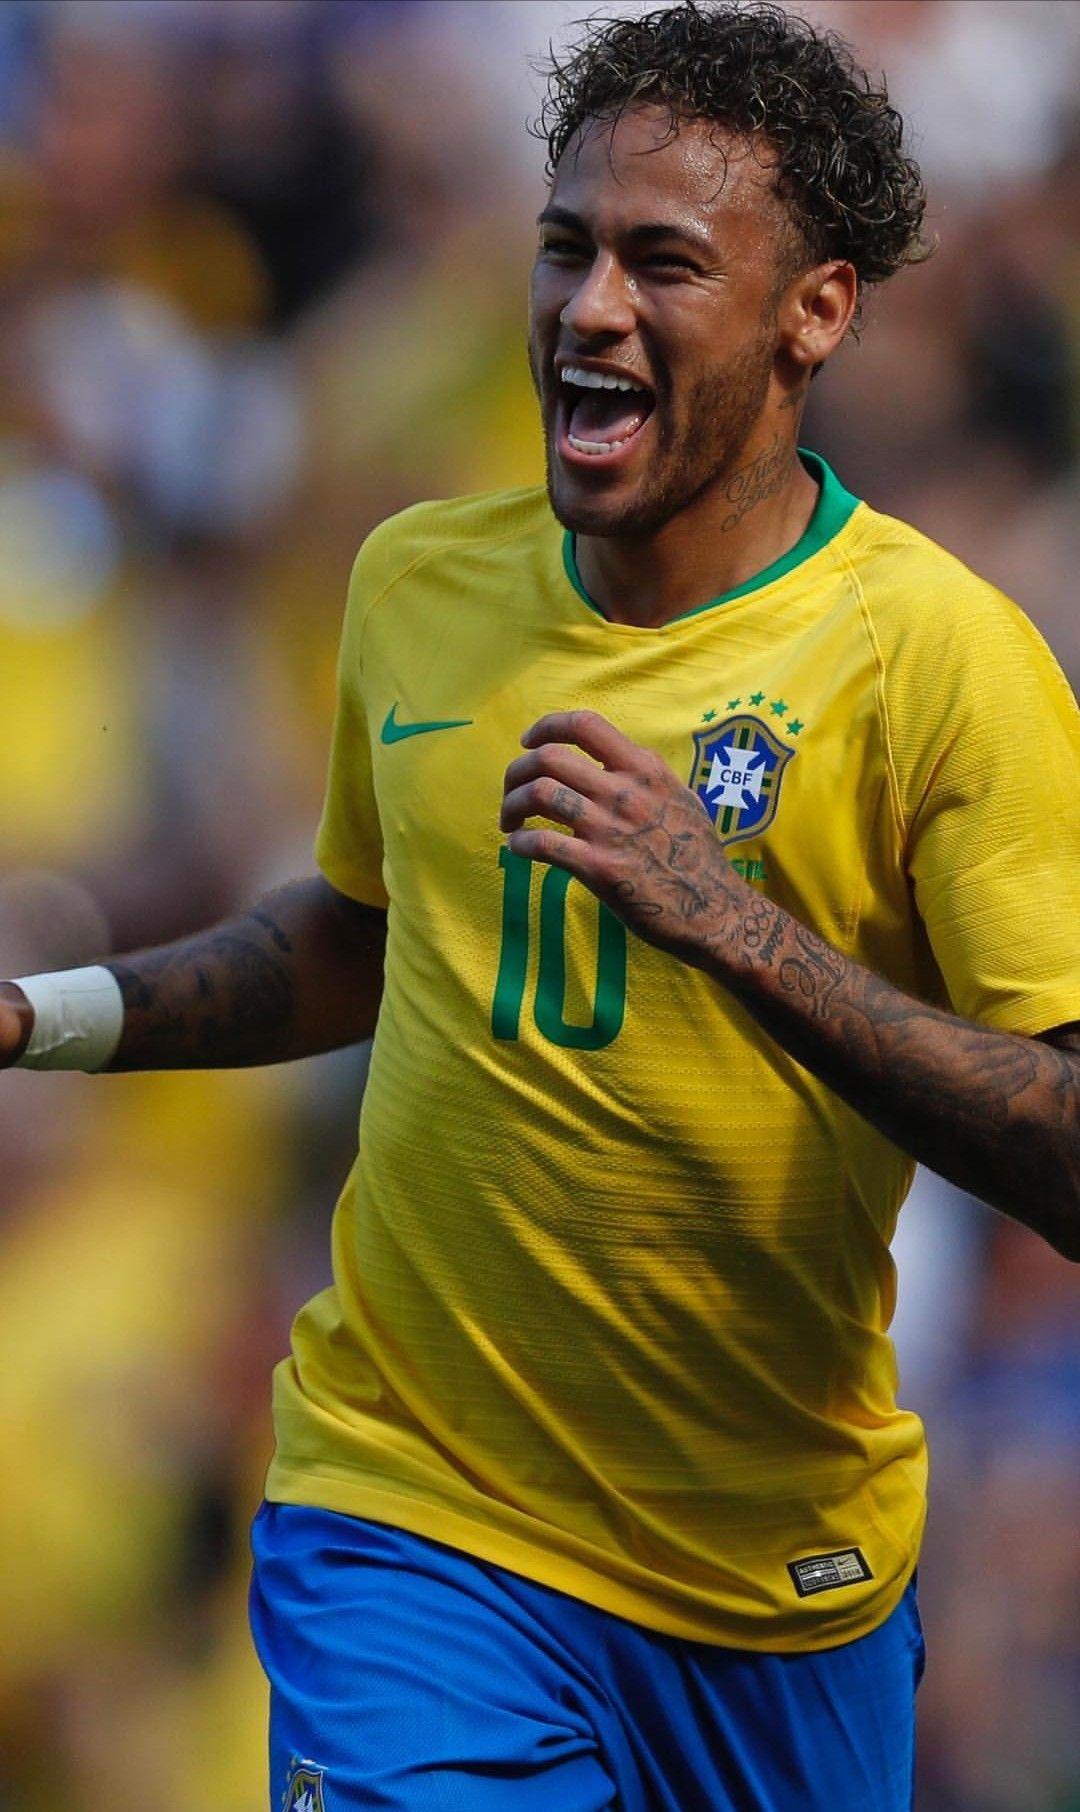 Pin De Saiifah Najan Em Neymar Jr Neymar Brasil Jogadores De Futebol Neymar Jr